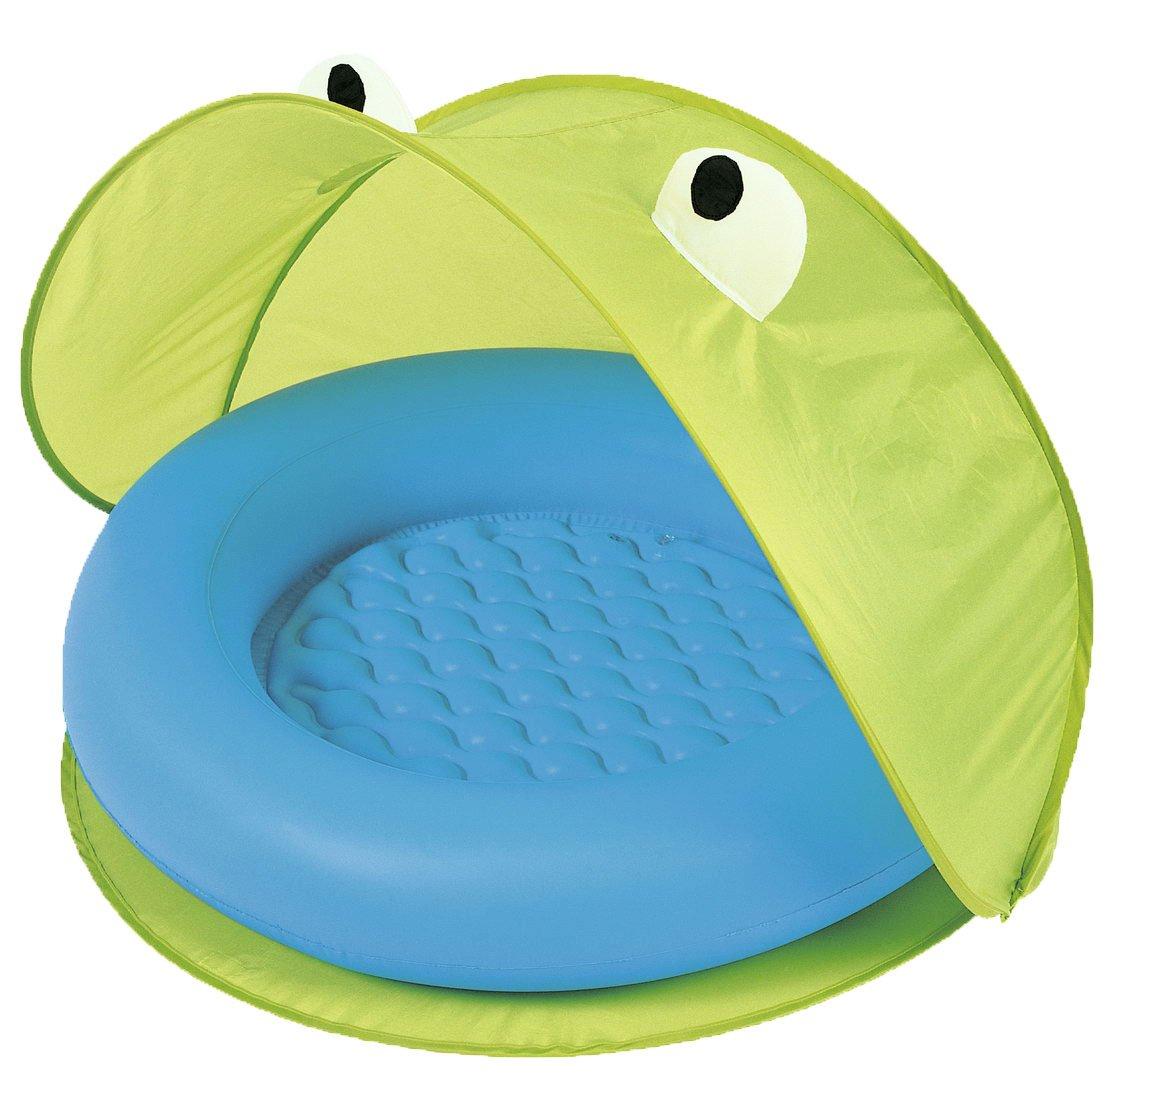 Woodega Bestway® Piscina infantil con pop-up tienda ...